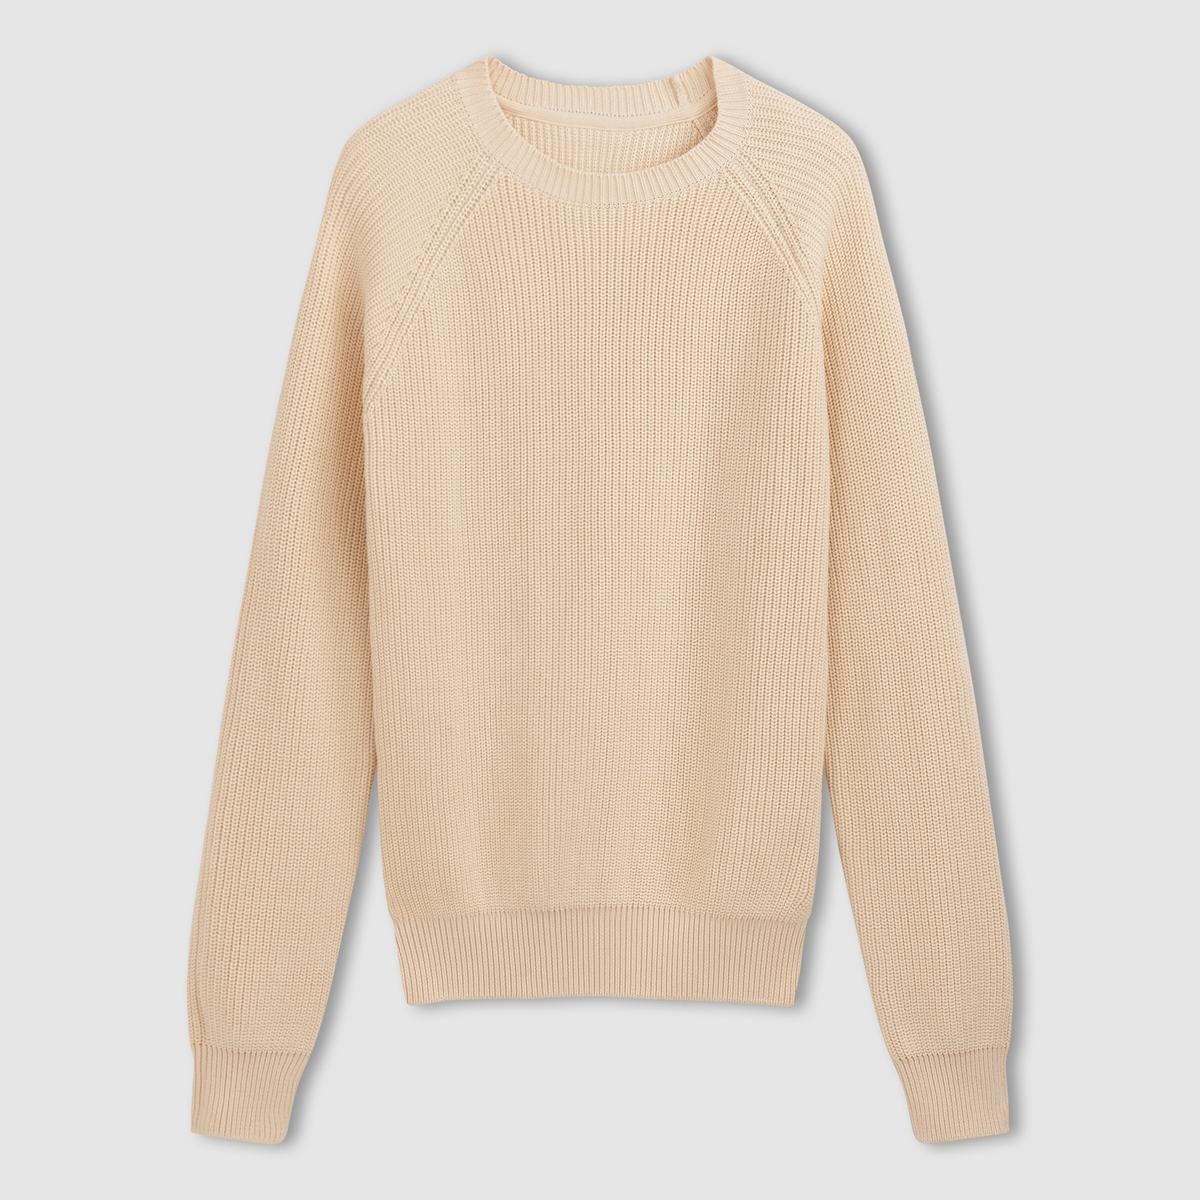 Пуловер из фантазийного трикотажа, 100% хлопка